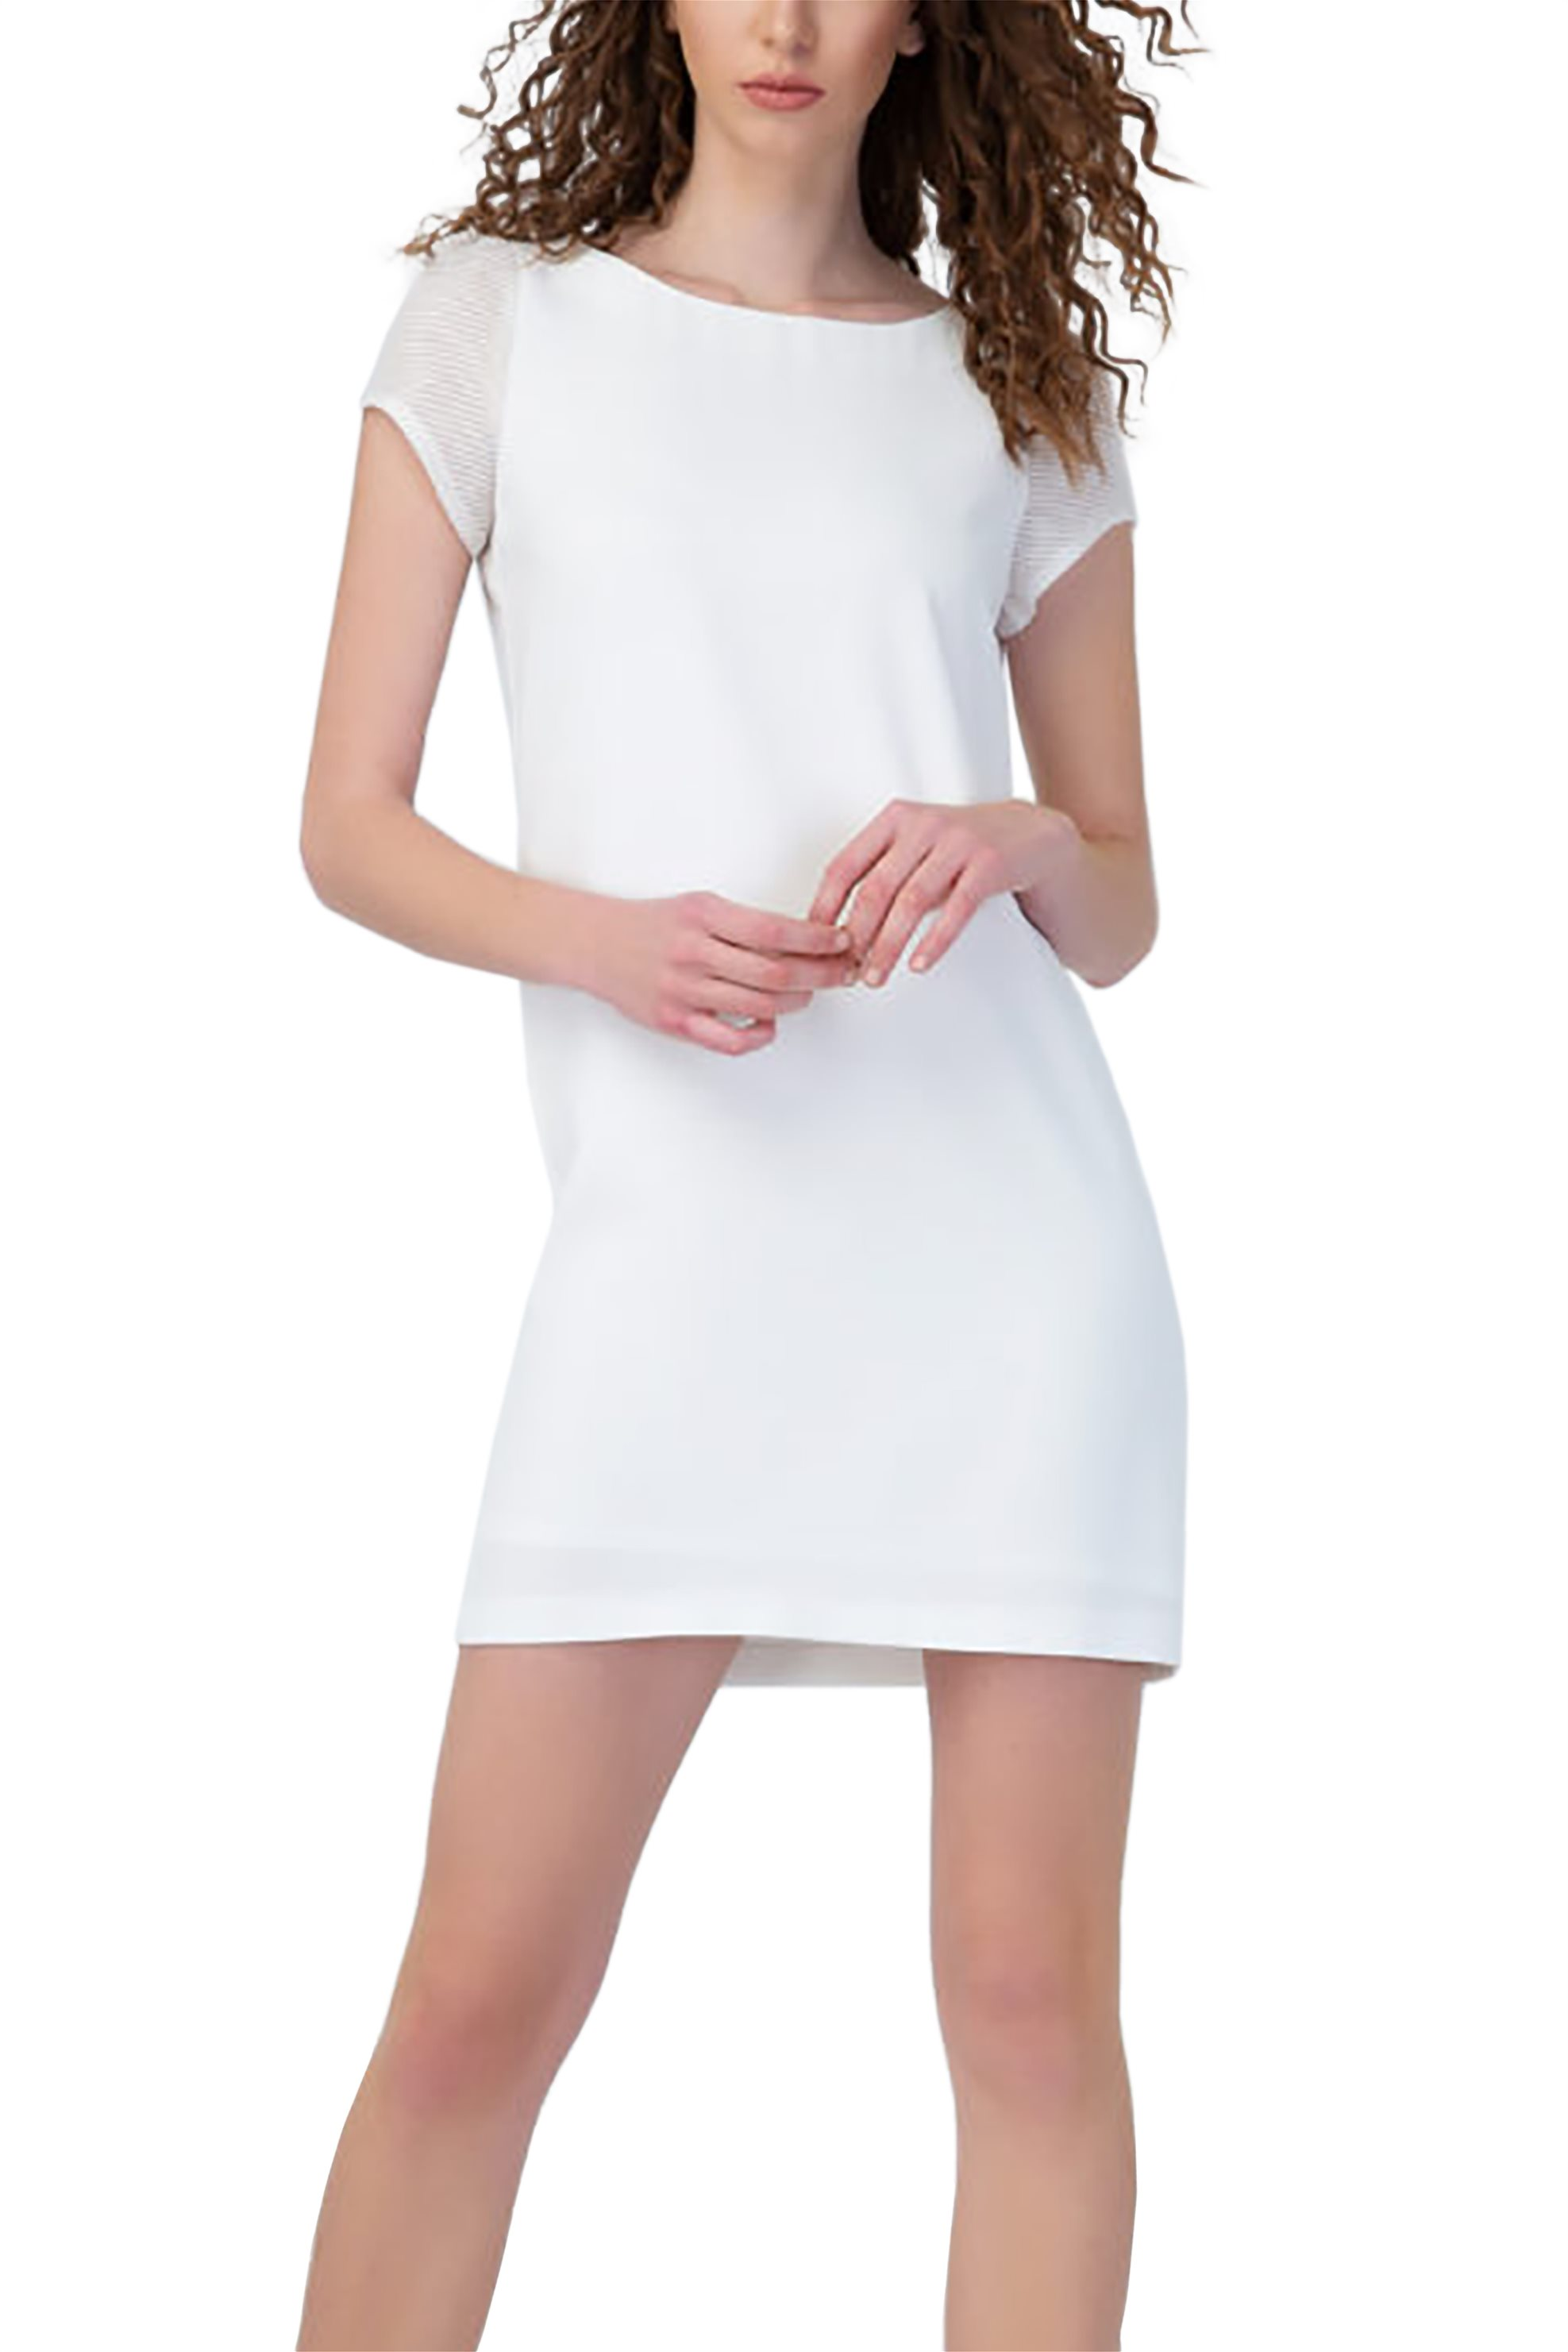 874a4bf8c4c1 Notos Billy Sabbado γυναικείο mini φόρεμα με διαφάνεια στα μανίκια -  292917277 - Λευκό